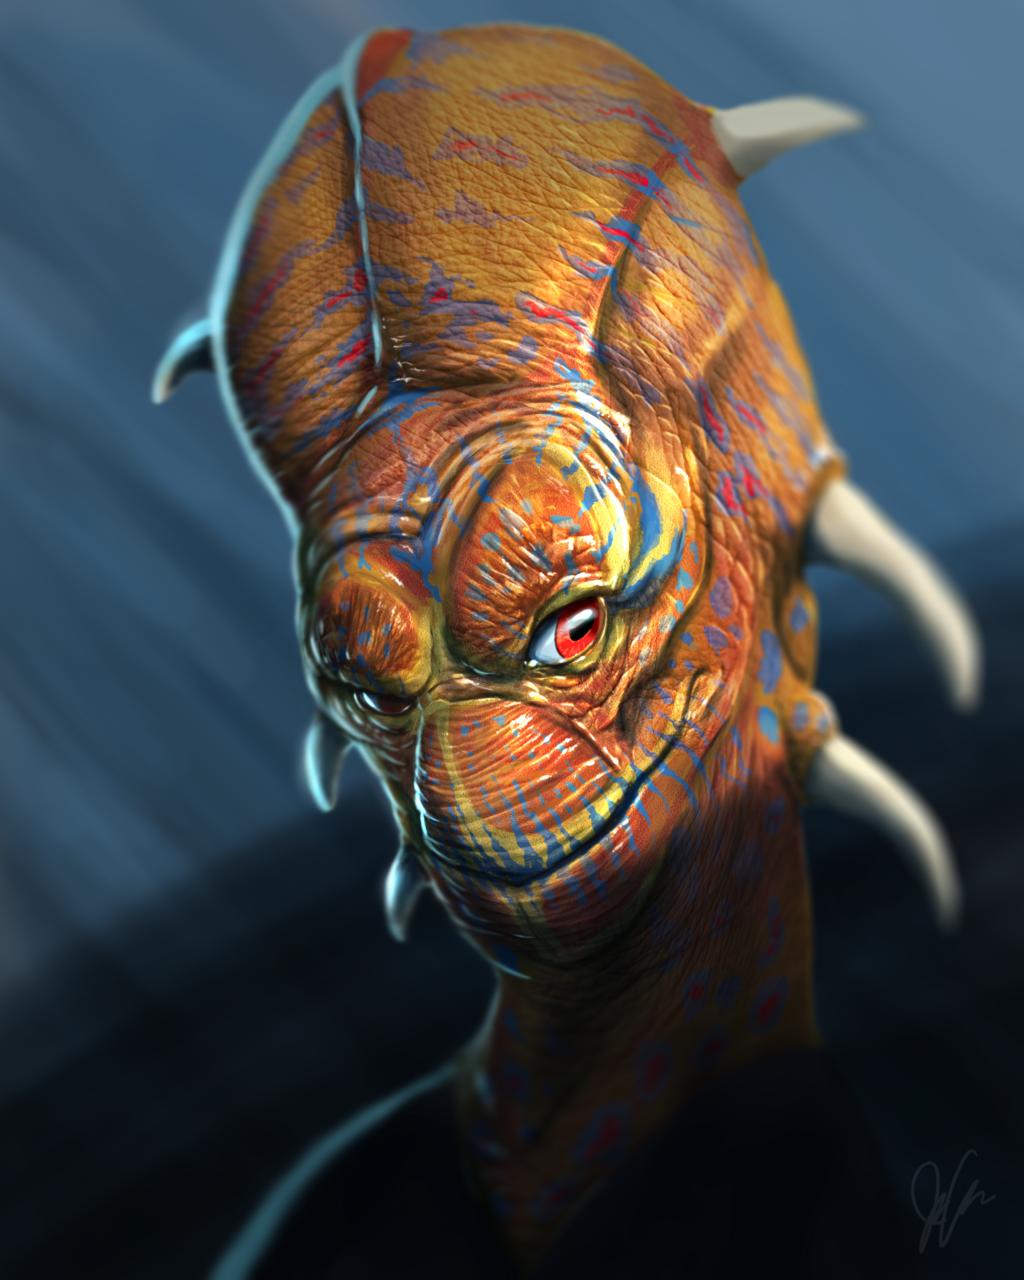 Most recent image: Alien Aaron Blaise Tutorial